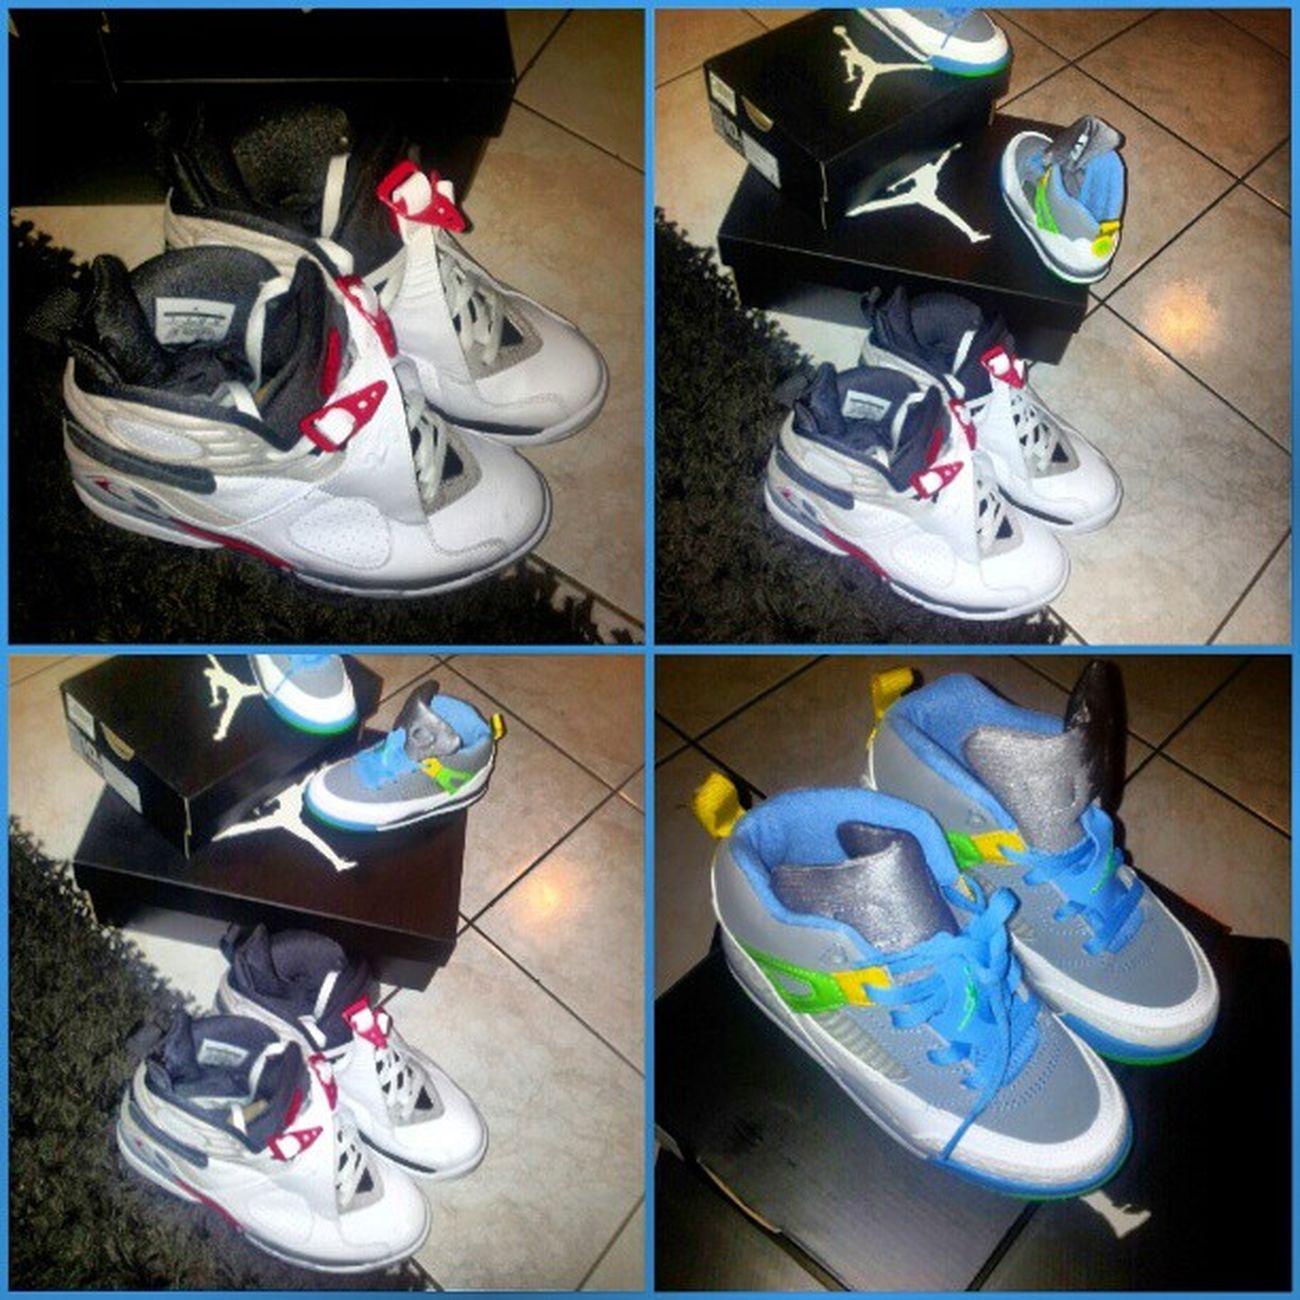 ... Telperetelfils Jojo Jordan8 Jordan jordanspizike tbt sneakercommunity sneaker instapicframes instamania instalike shoestagram shootime shopping goodtime goodlike goodday instagood ' French paris '